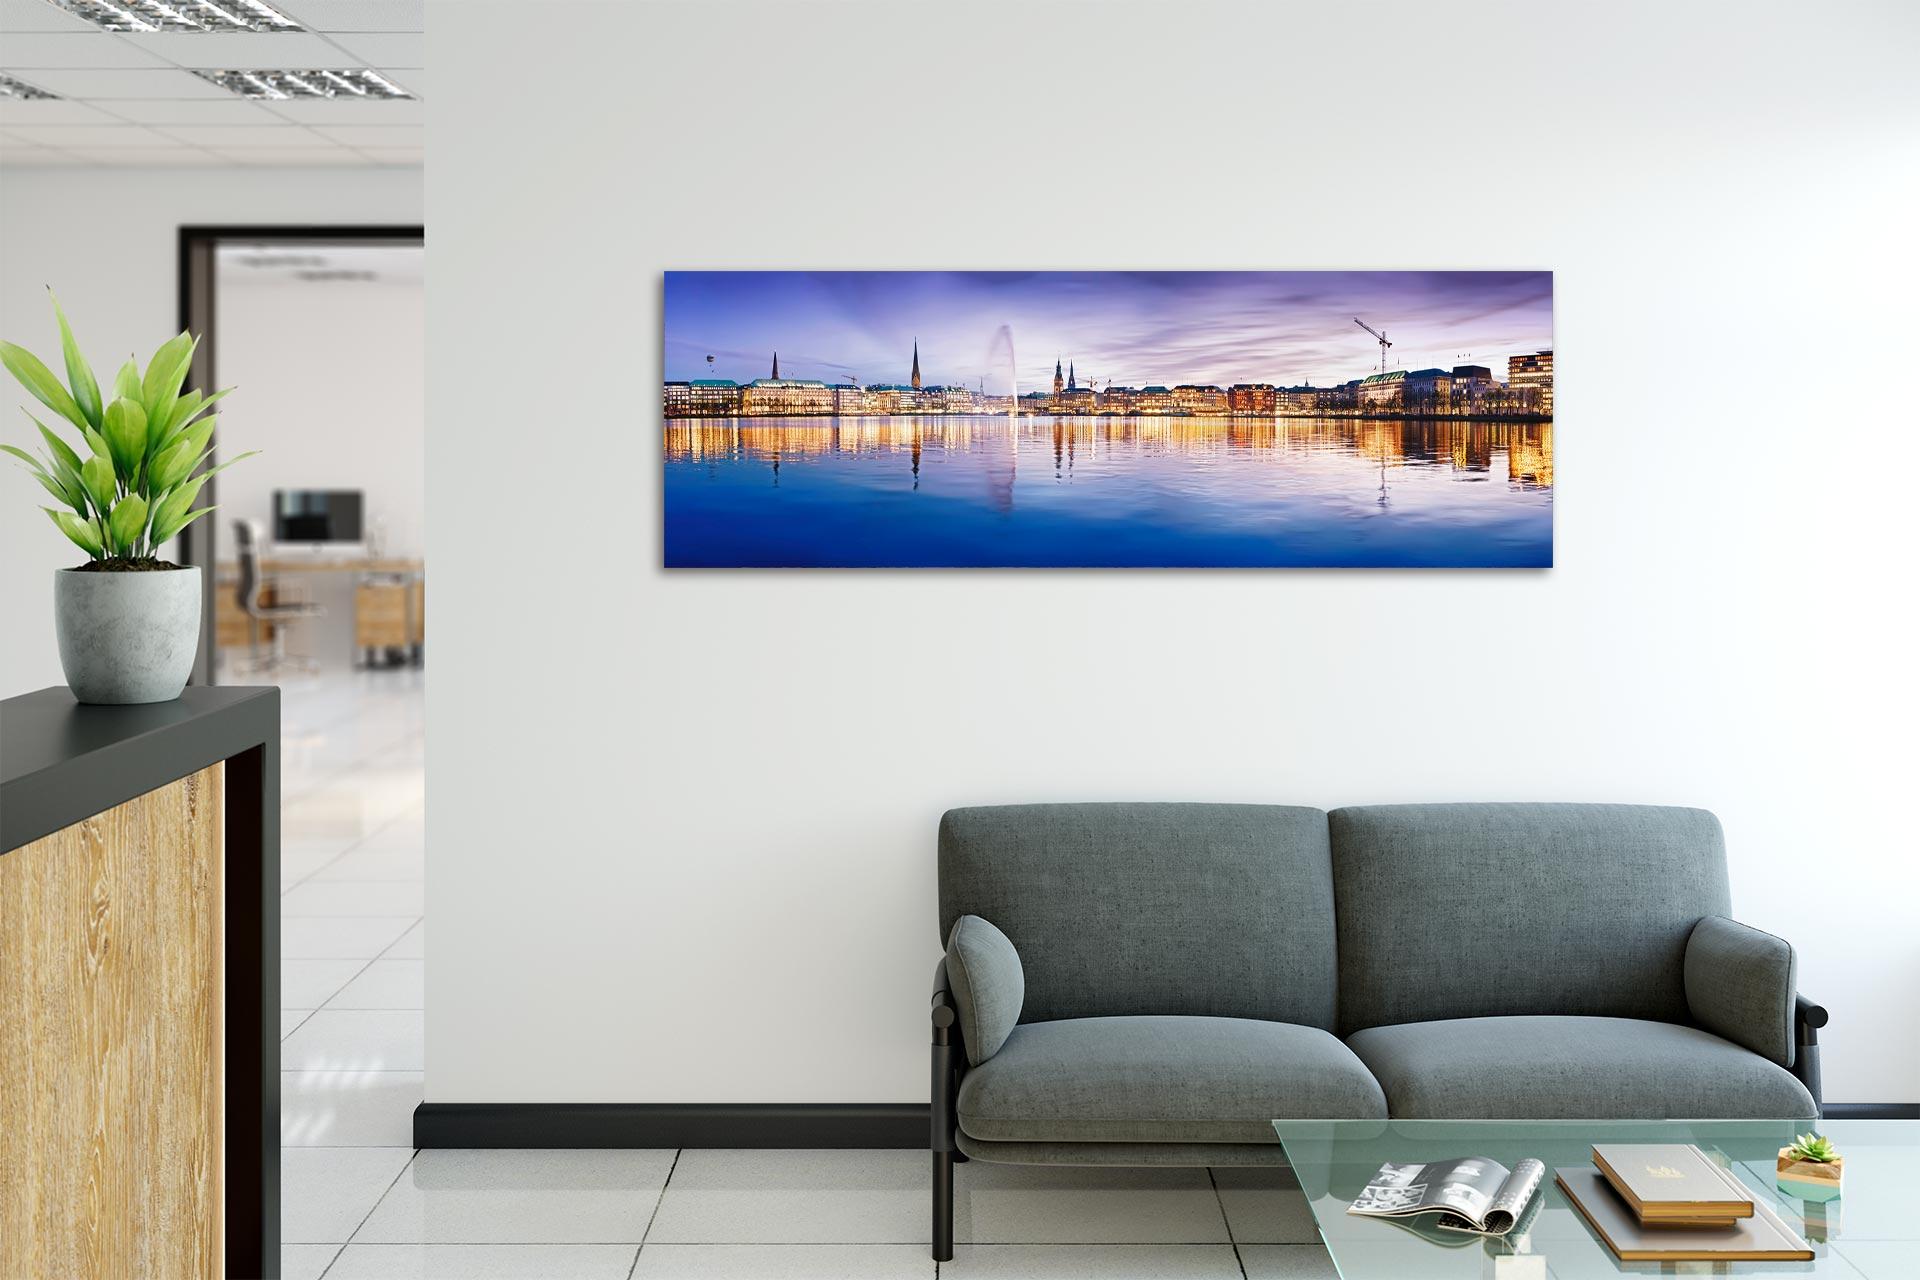 TG075-binnenalster-panorama-leinwand-acrylglas-aludibond-empfang